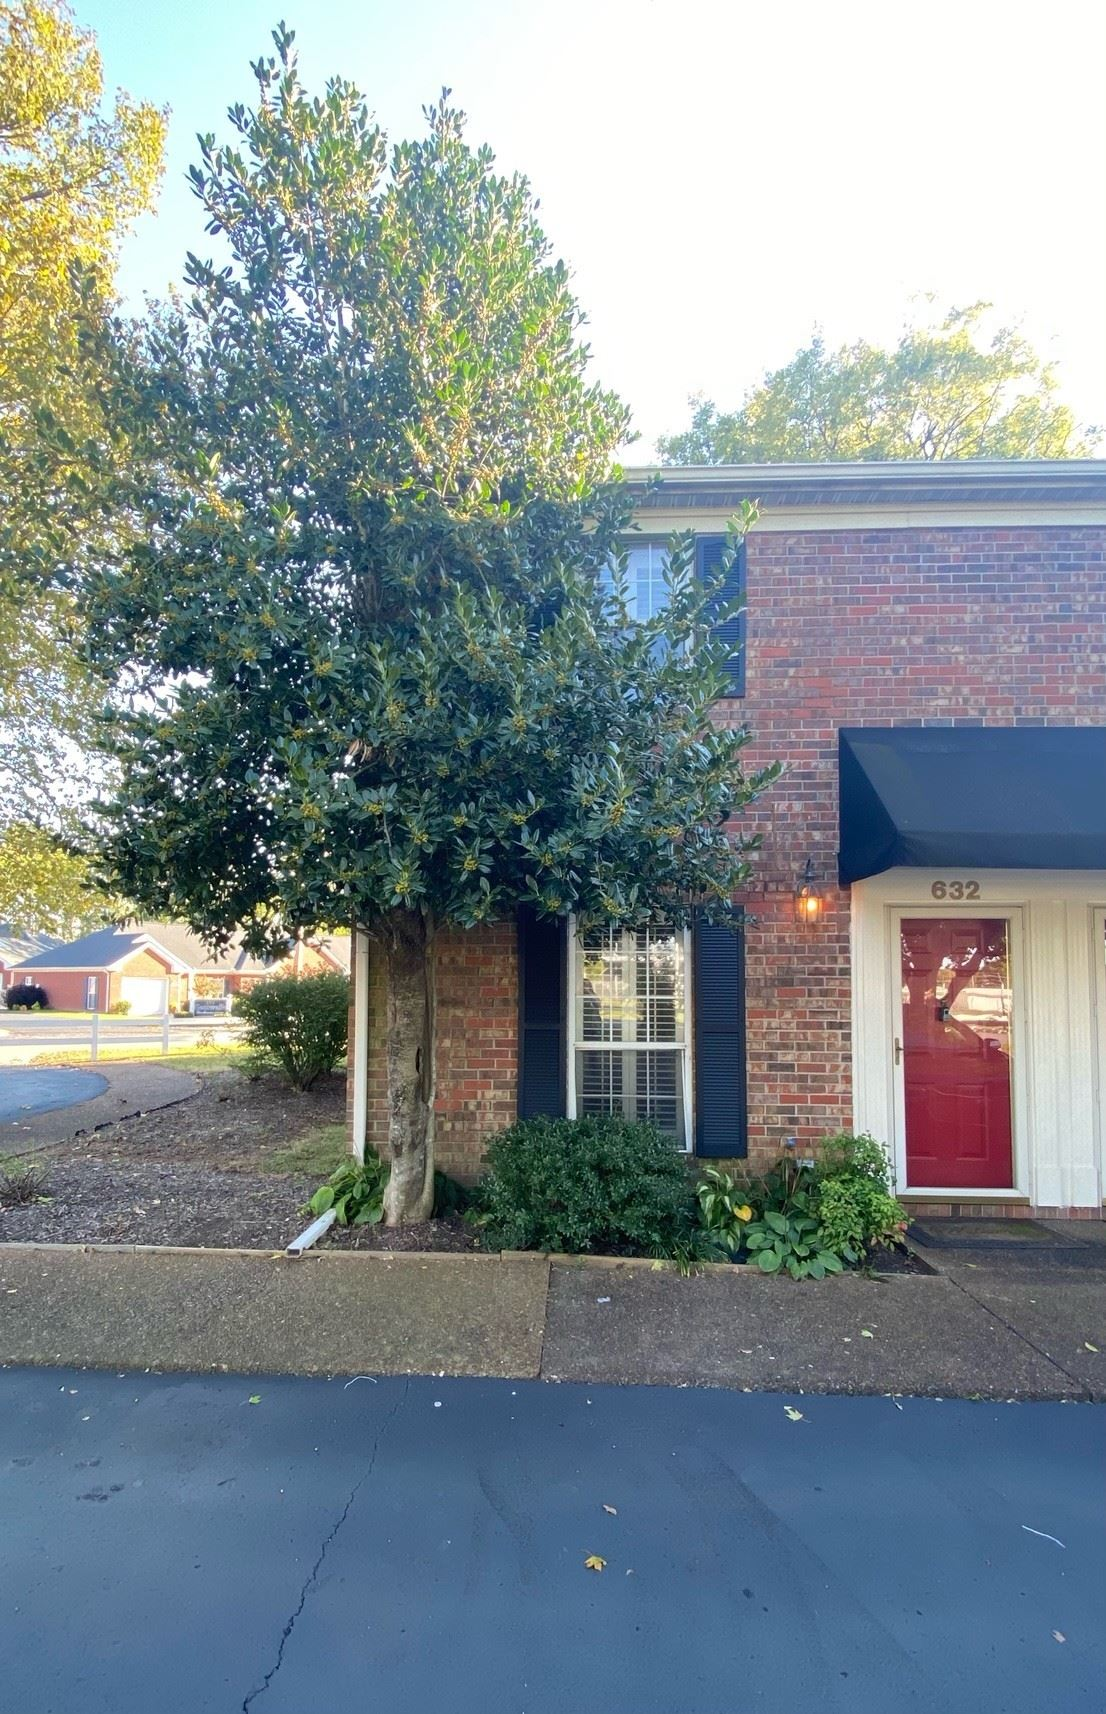 632 Calhoun St #632, Shelbyville, TN 37160 - MLS#: 2217406